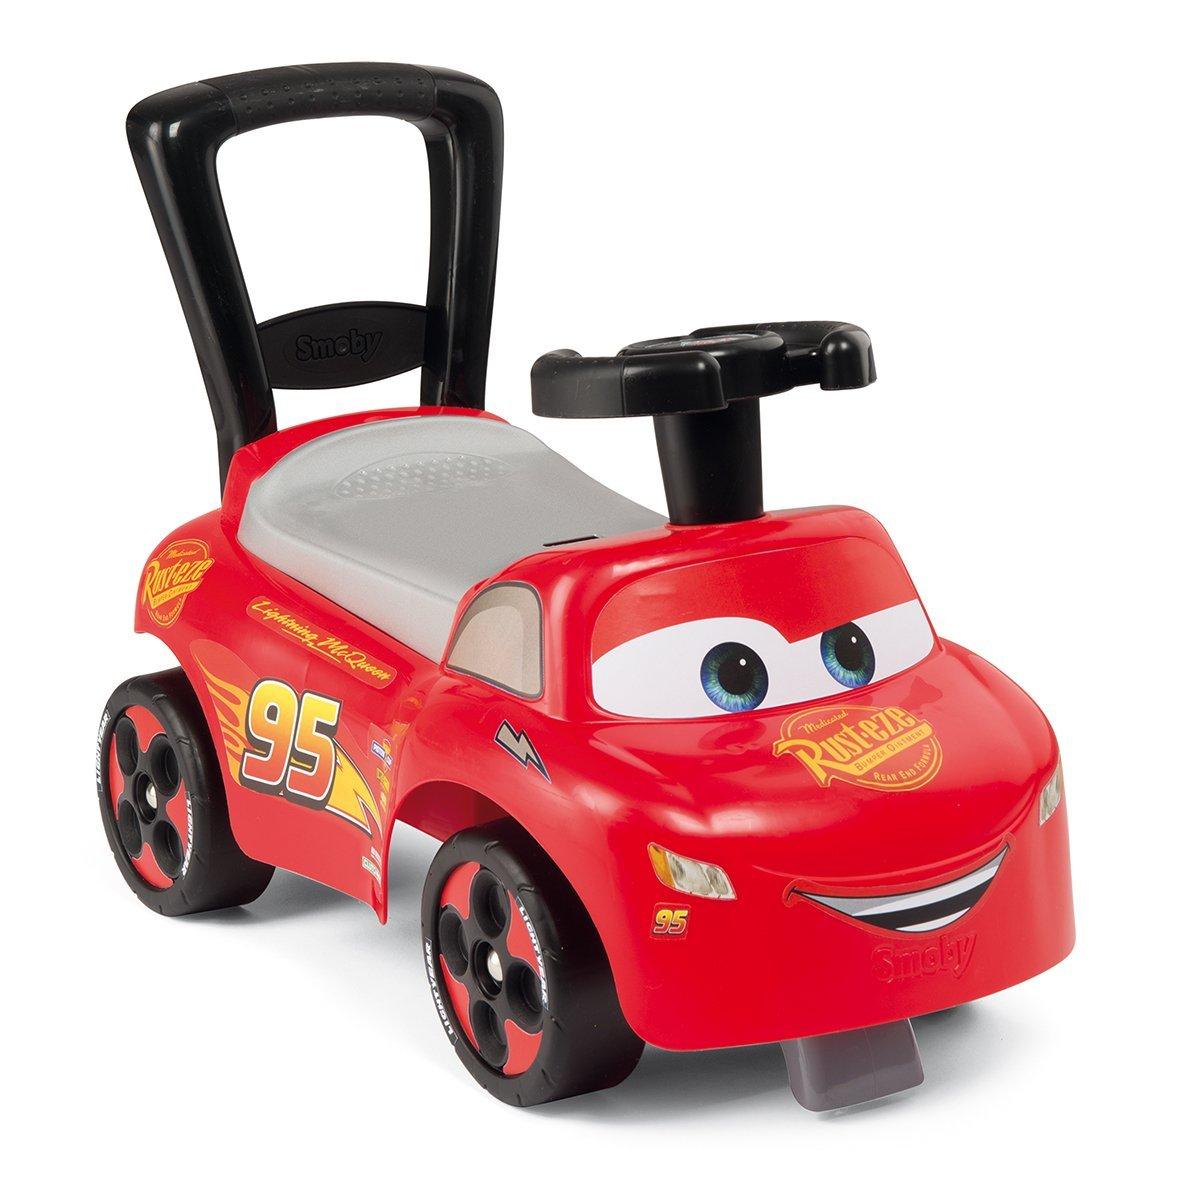 "Smoby™ - Mein erstes Auto Rutscherfahrzeug ""Disney Cars"" (720517) ab €4,99 [@Kik.de]"